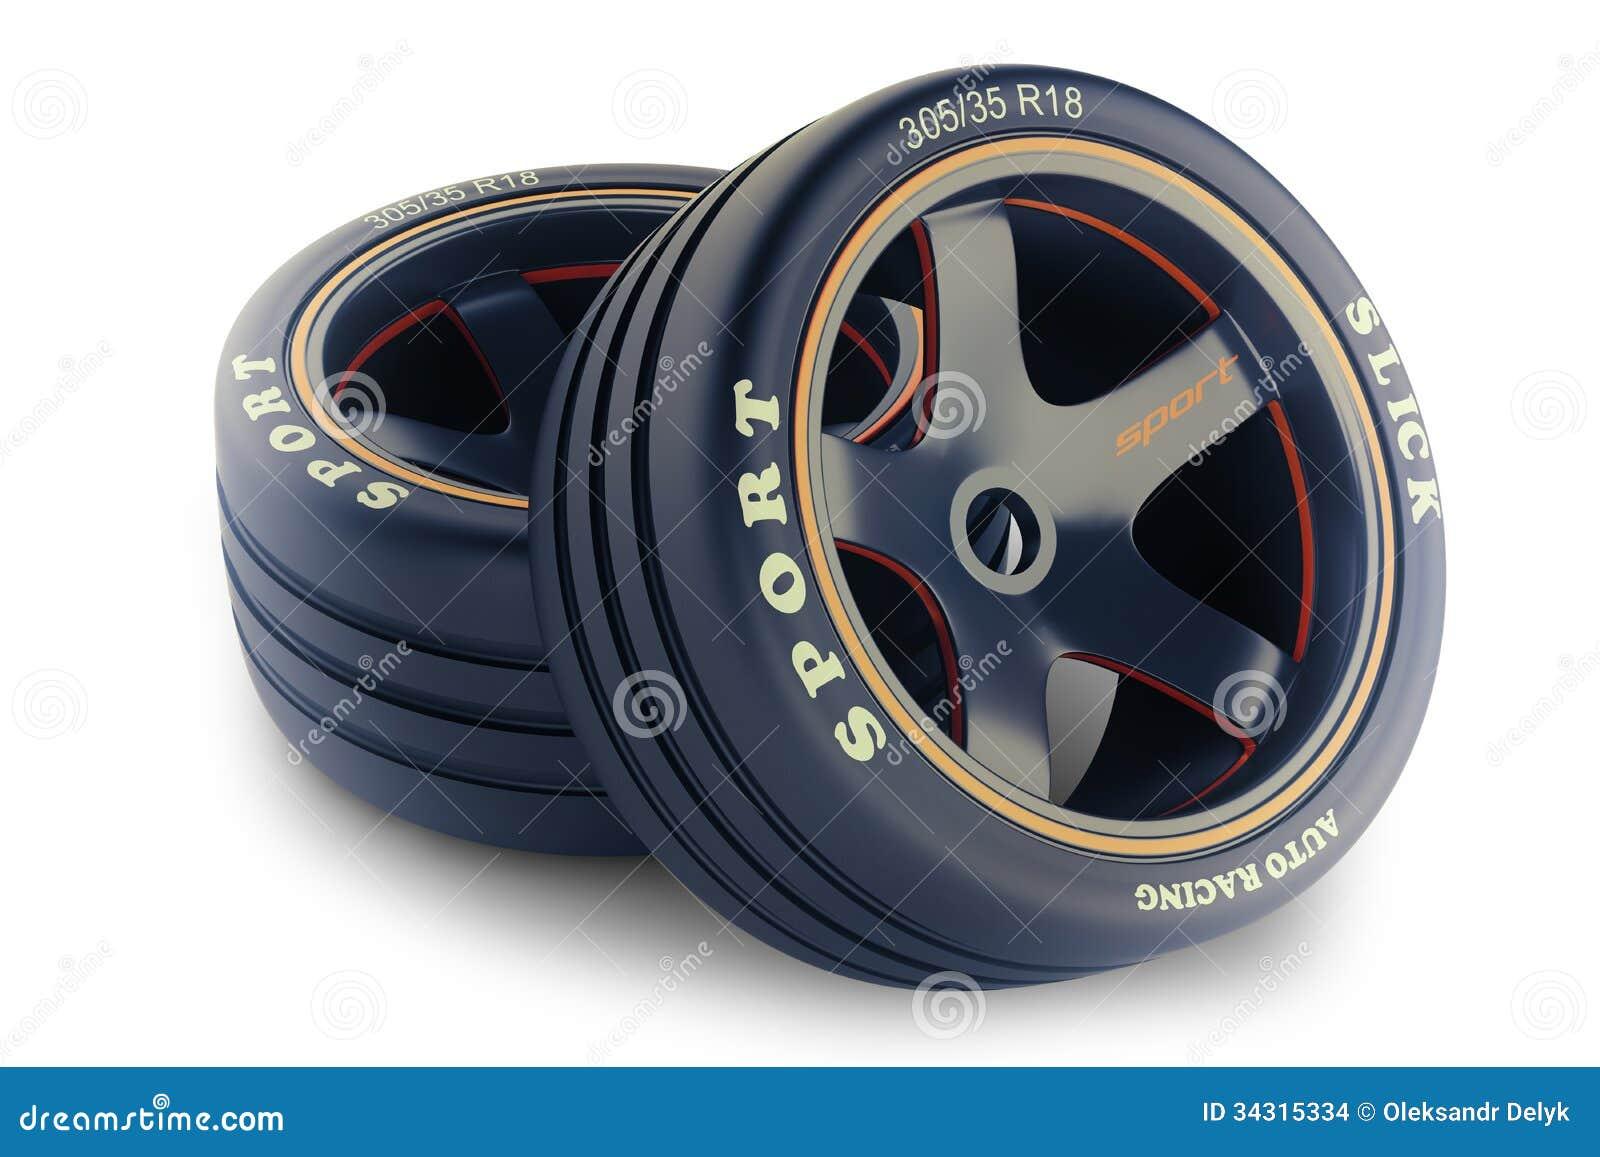 Slick Wheels Kit For Race Car Stock Images Image 34315334